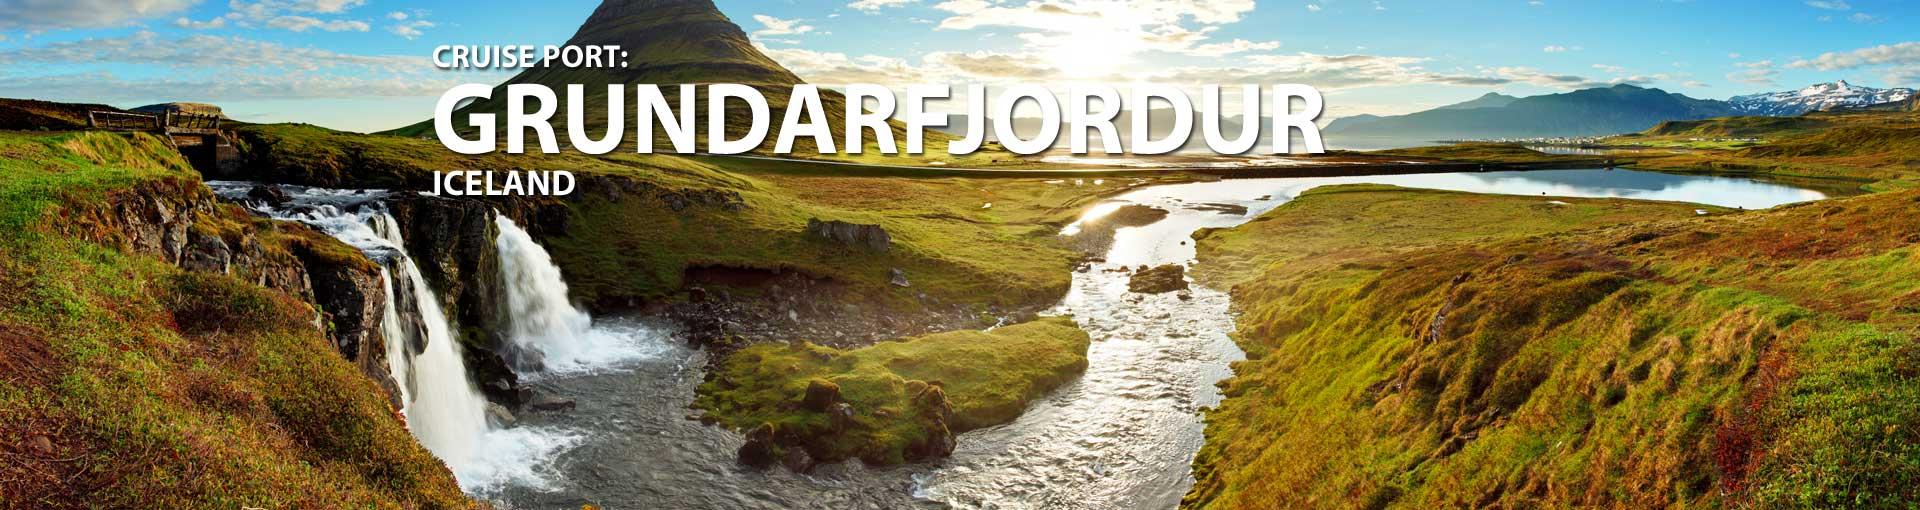 Cruises to Grundarfjordur, Iceland